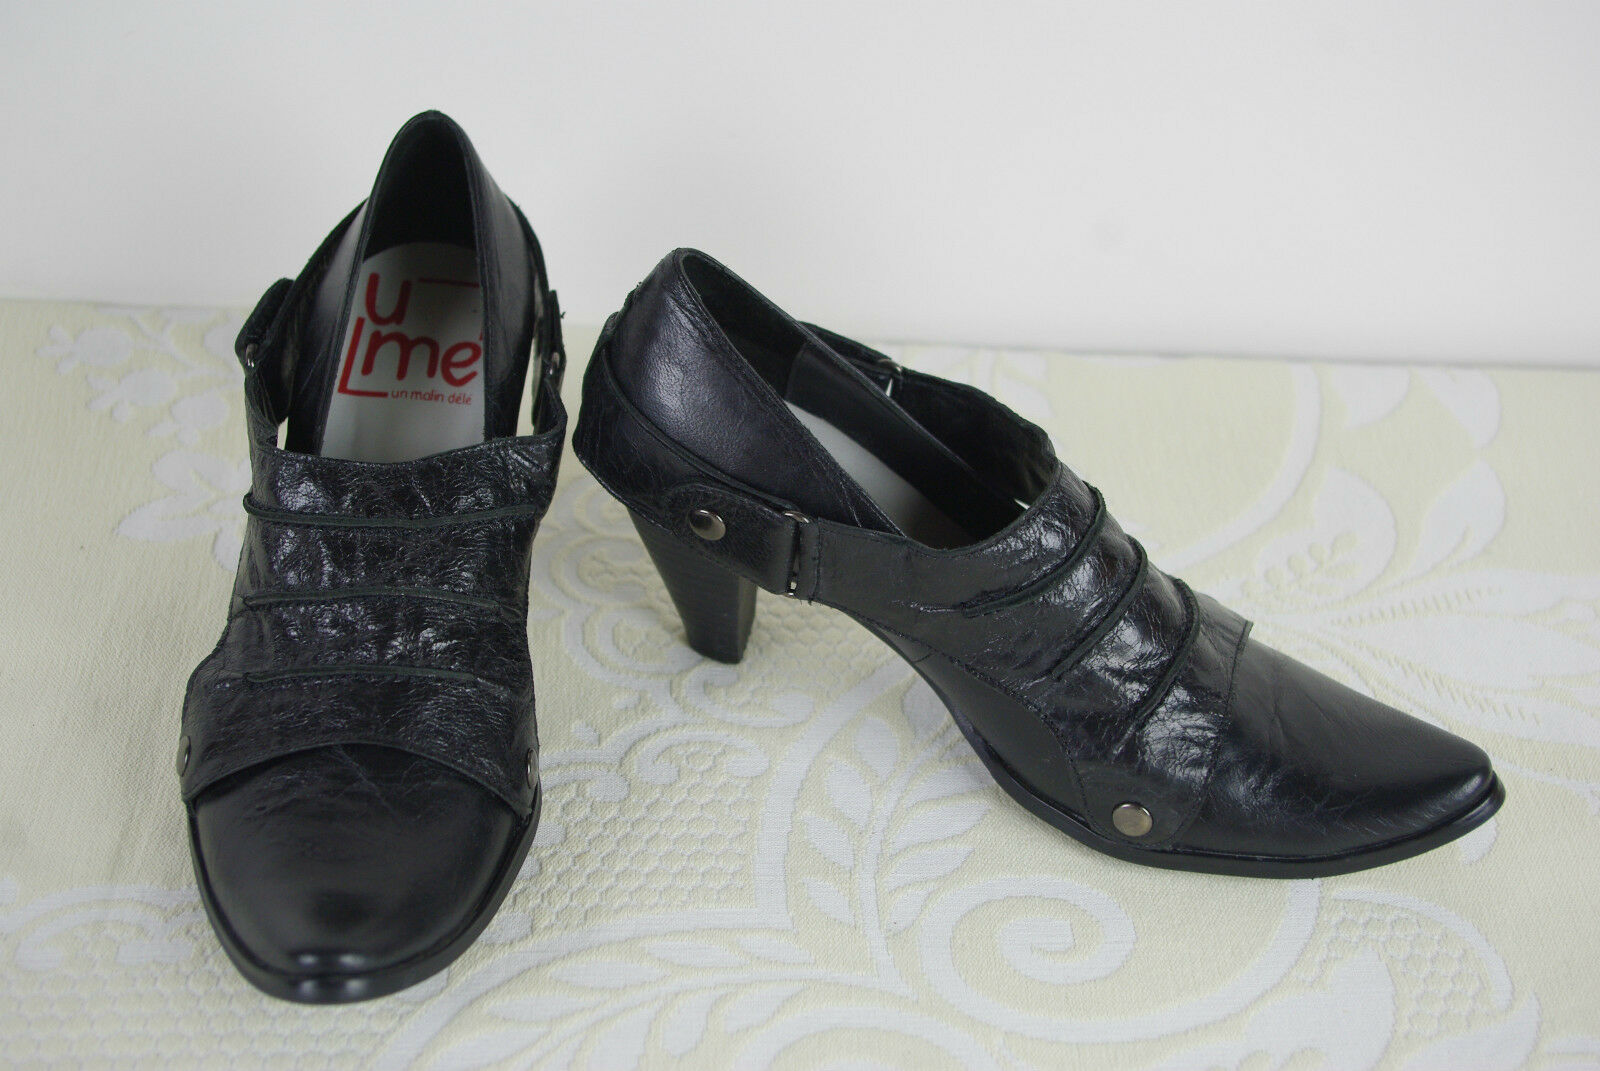 Pumps Pumps Pumps Stiefel UME Un Matin Sommer schwarzes Leder T 36 top Zustand f7e687